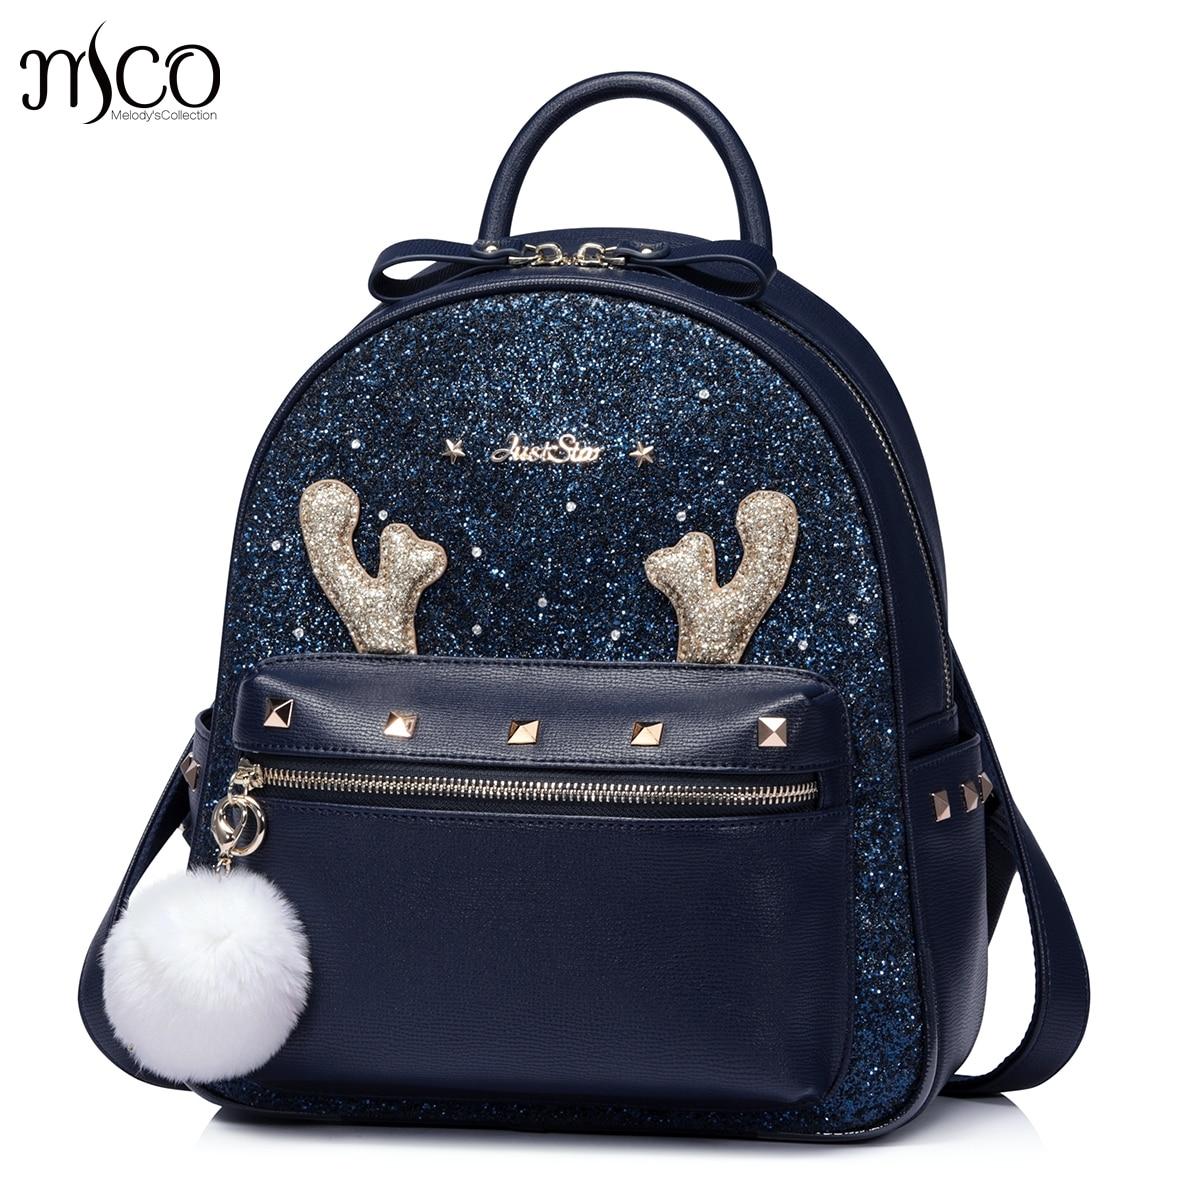 91da461e7e9b Women Backpack Big Cornu Cervi Crown Embroidered Sequins Backpack ...